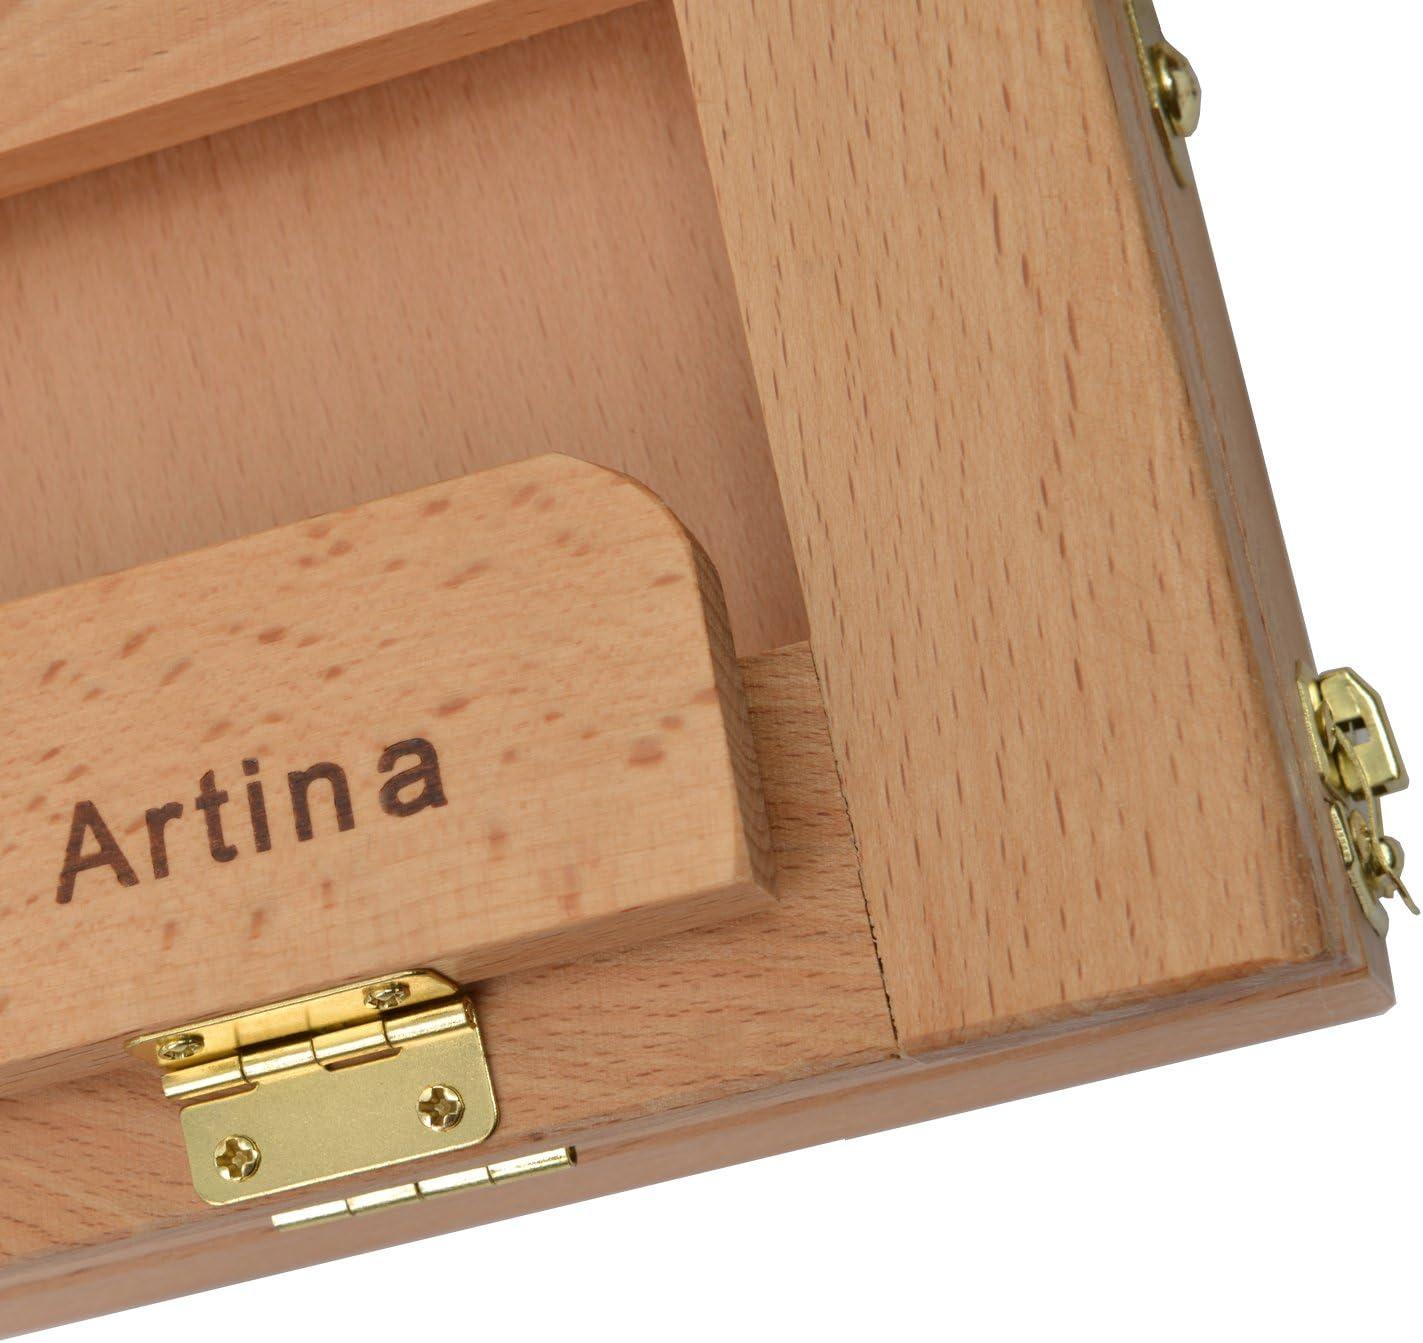 Artina Kofferstaffelei Colmar aus massivem Buchenholz mit Malset inkl Pinselset Malkarton und Acrylfarben